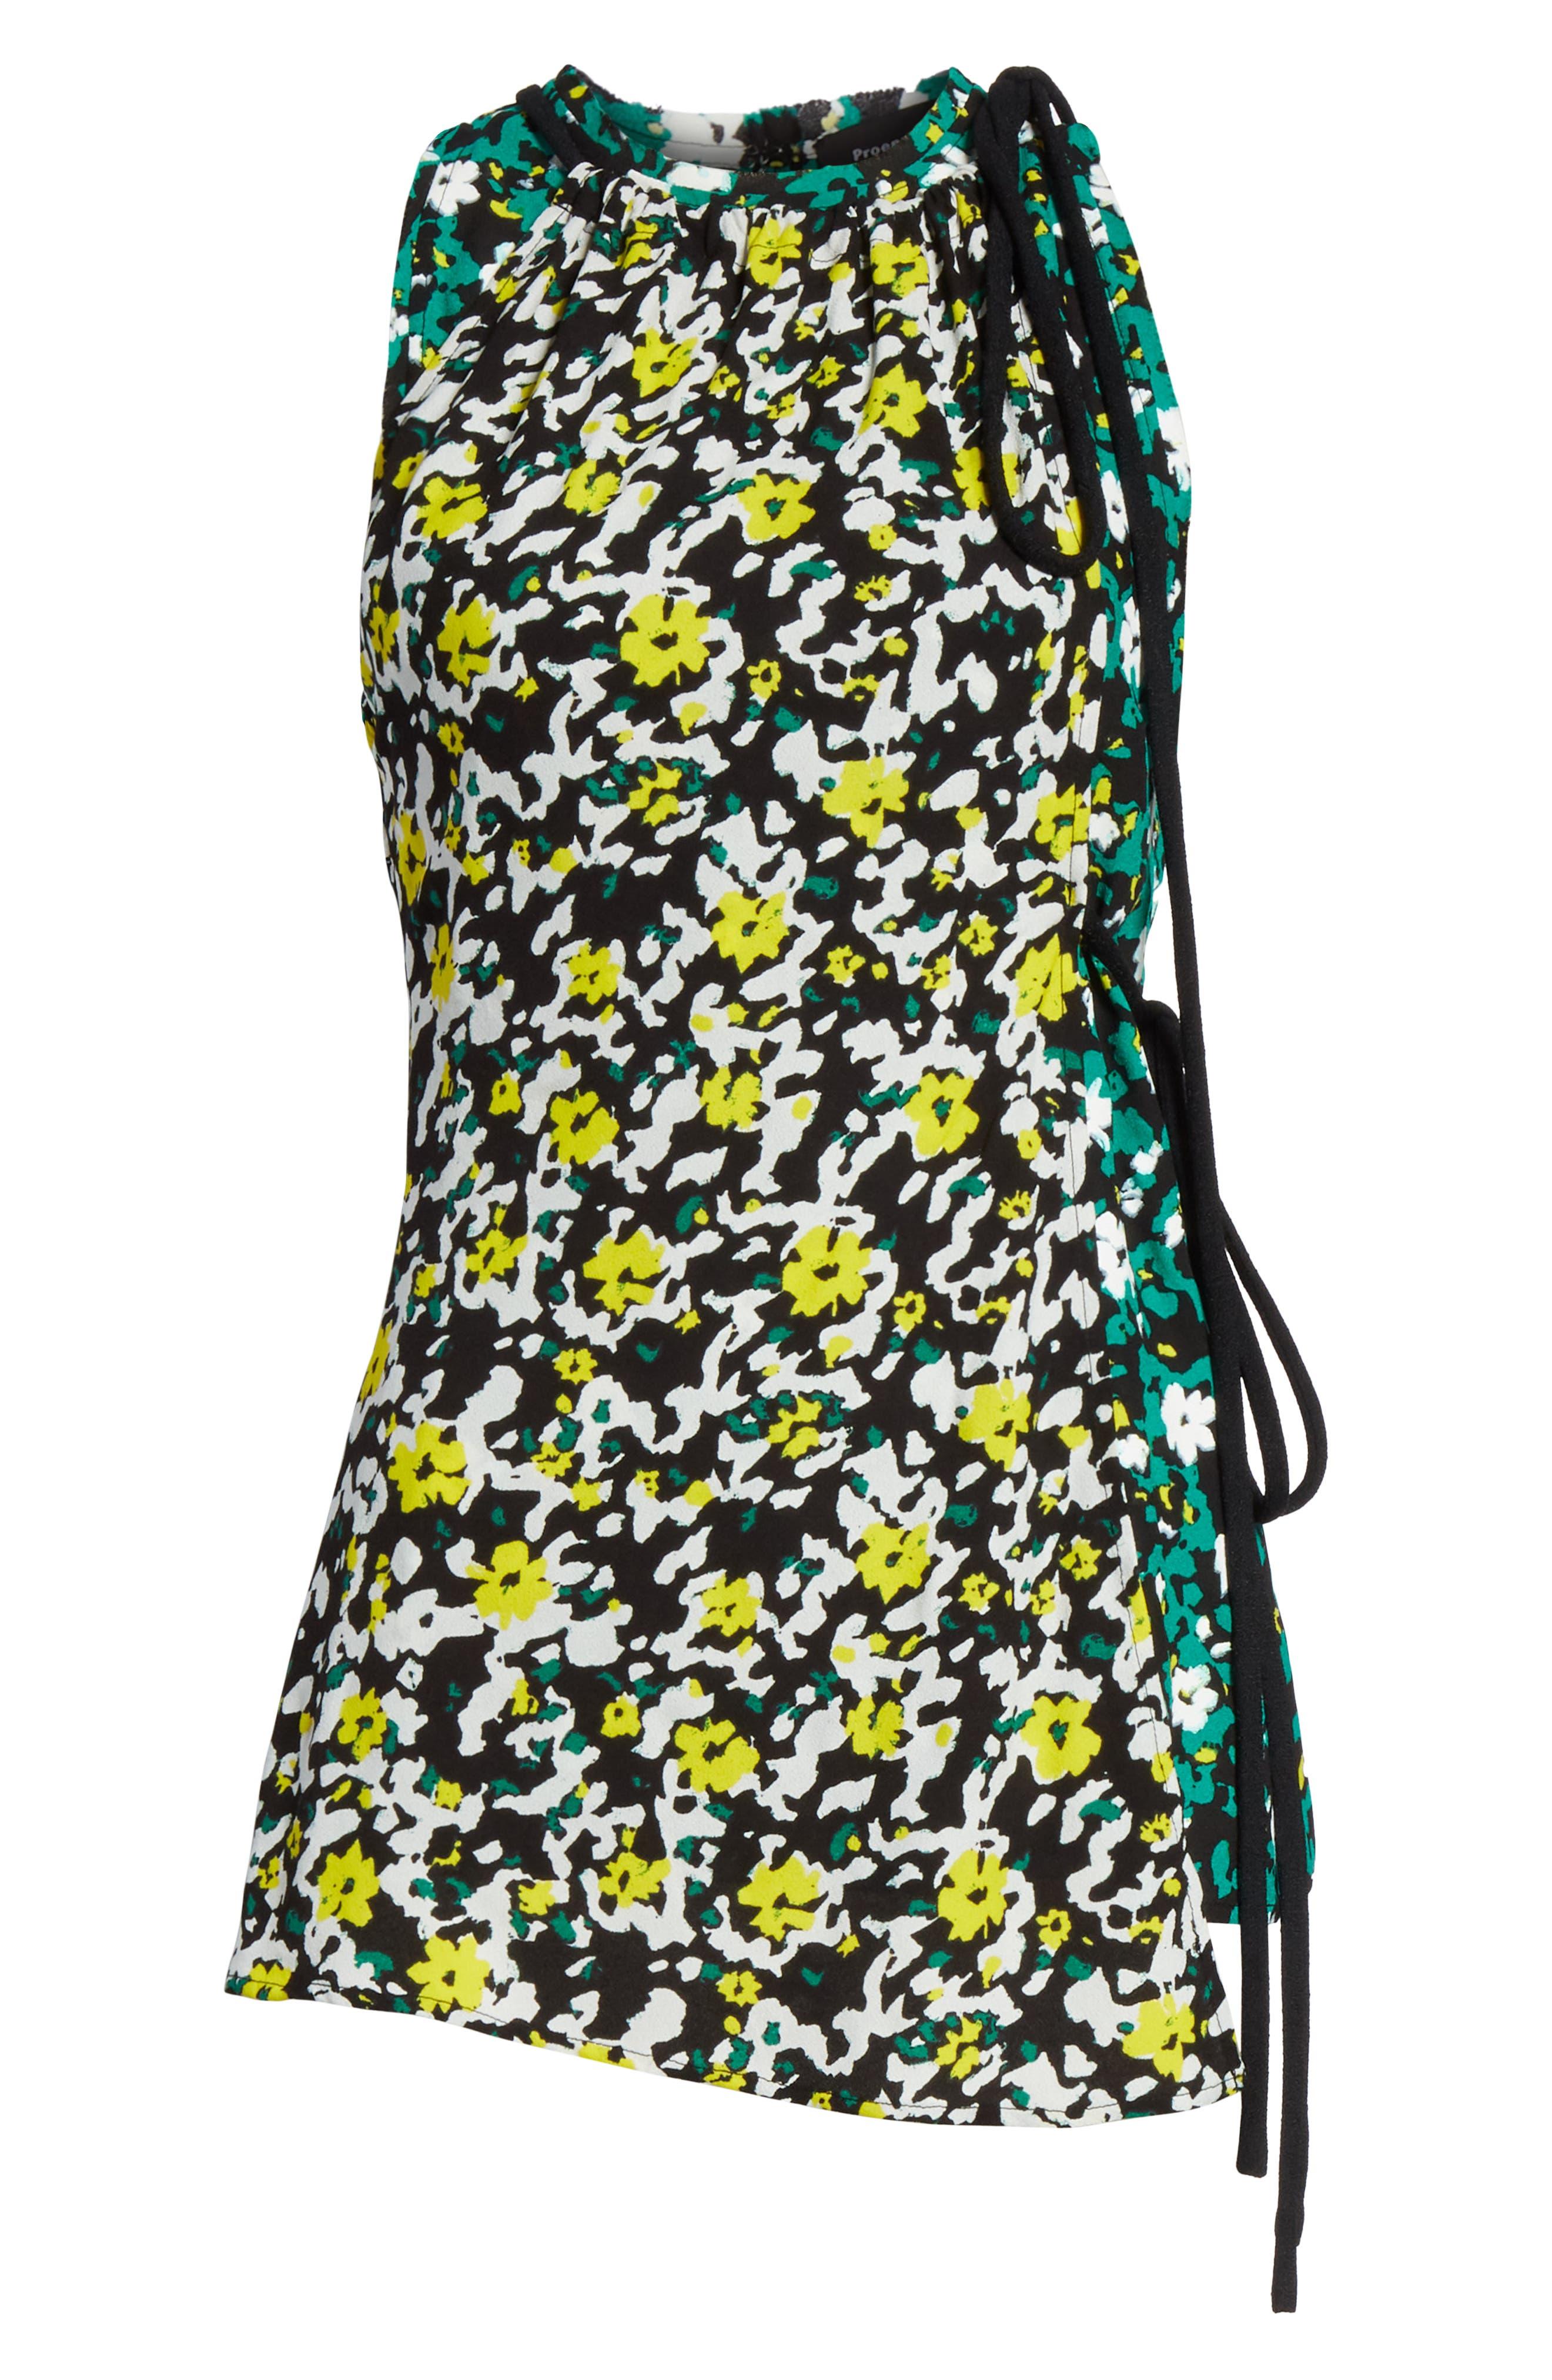 PROENZA SCHOULER, Side Tie Floral Print Blouse, Alternate thumbnail 6, color, WHITE WILDFLOWER